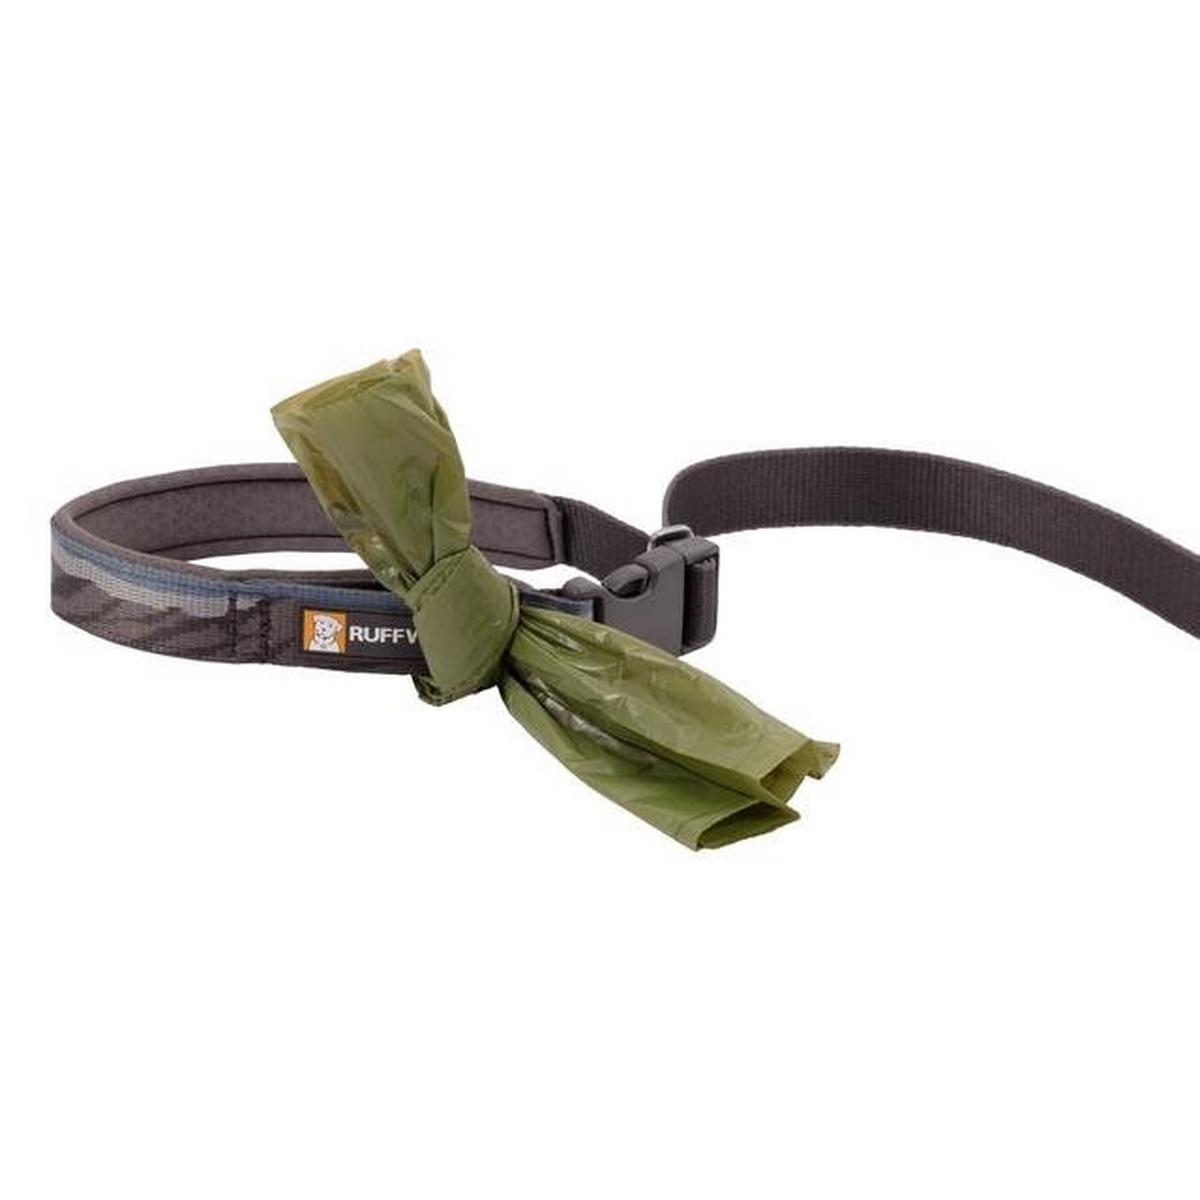 Ruffwear Flat Out Adjustable Dog Leash - Rocky Mountains